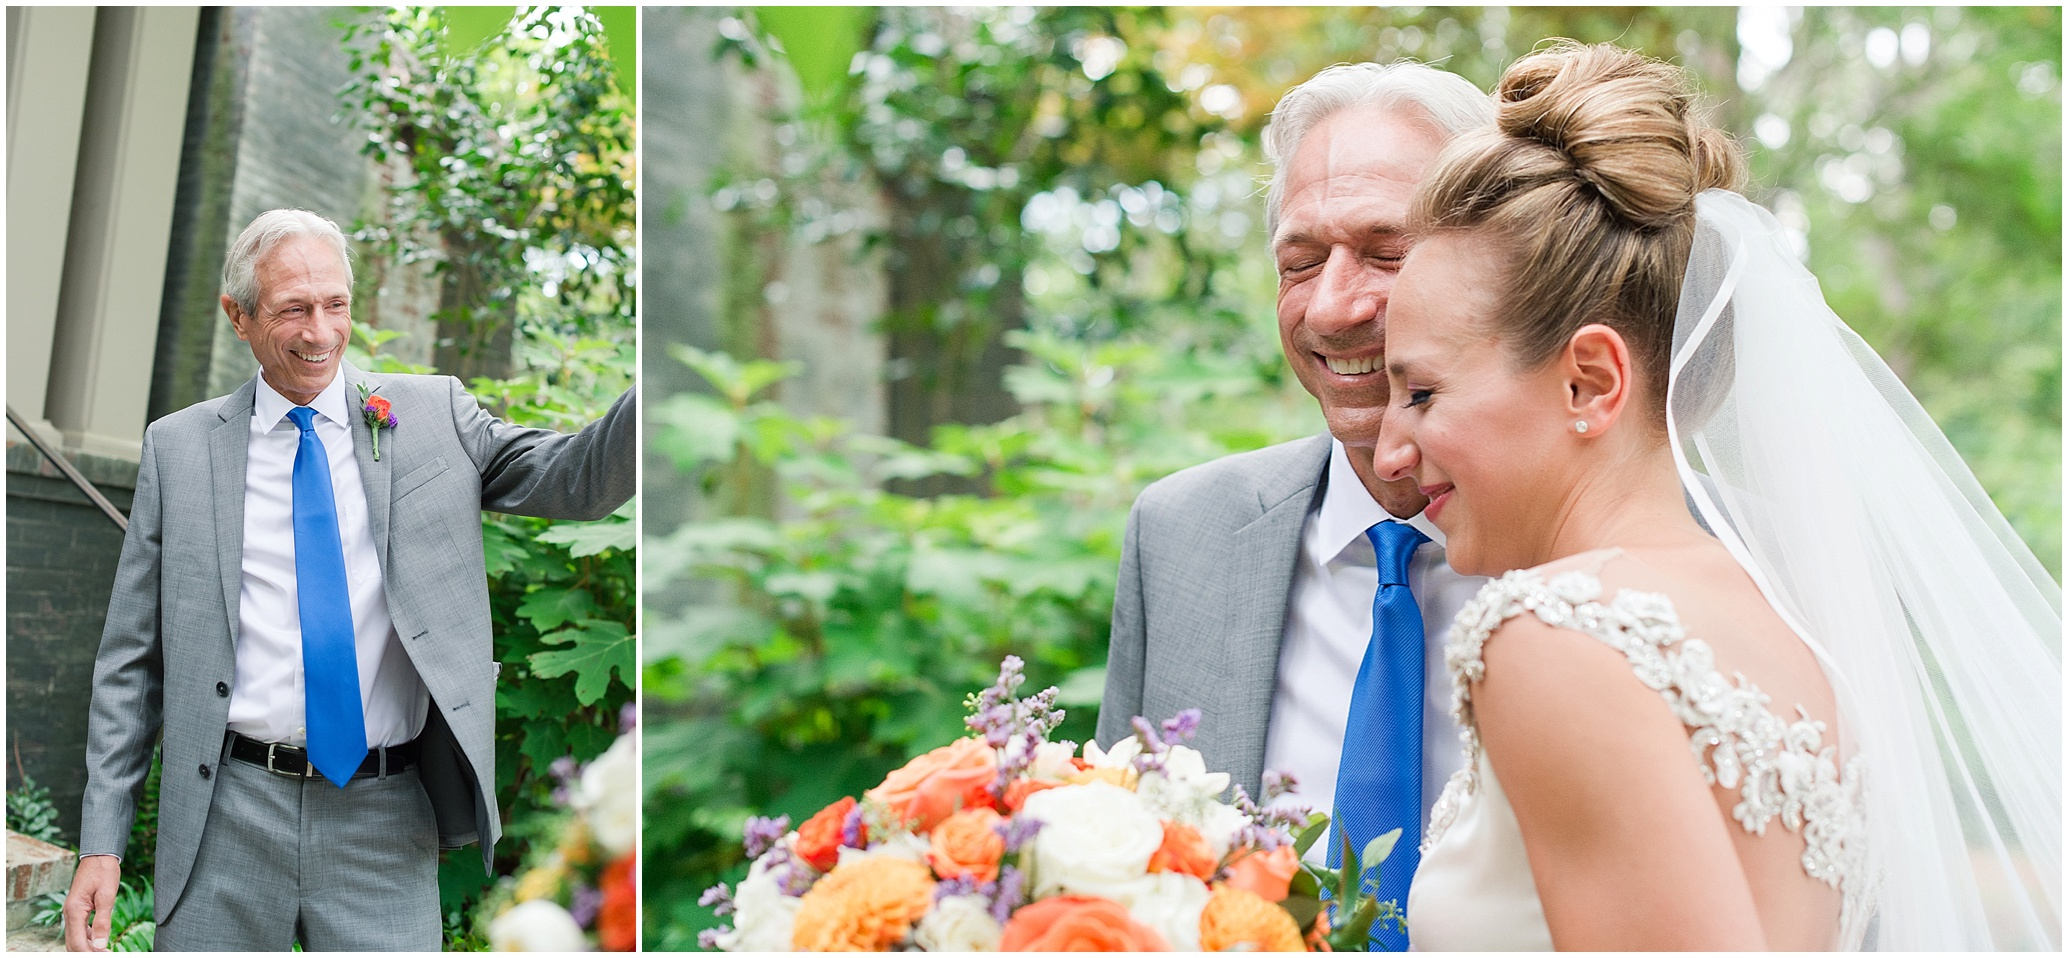 Hannah Leigh Photography Brookgreen Gardens Destination Wedding_0568.jpg